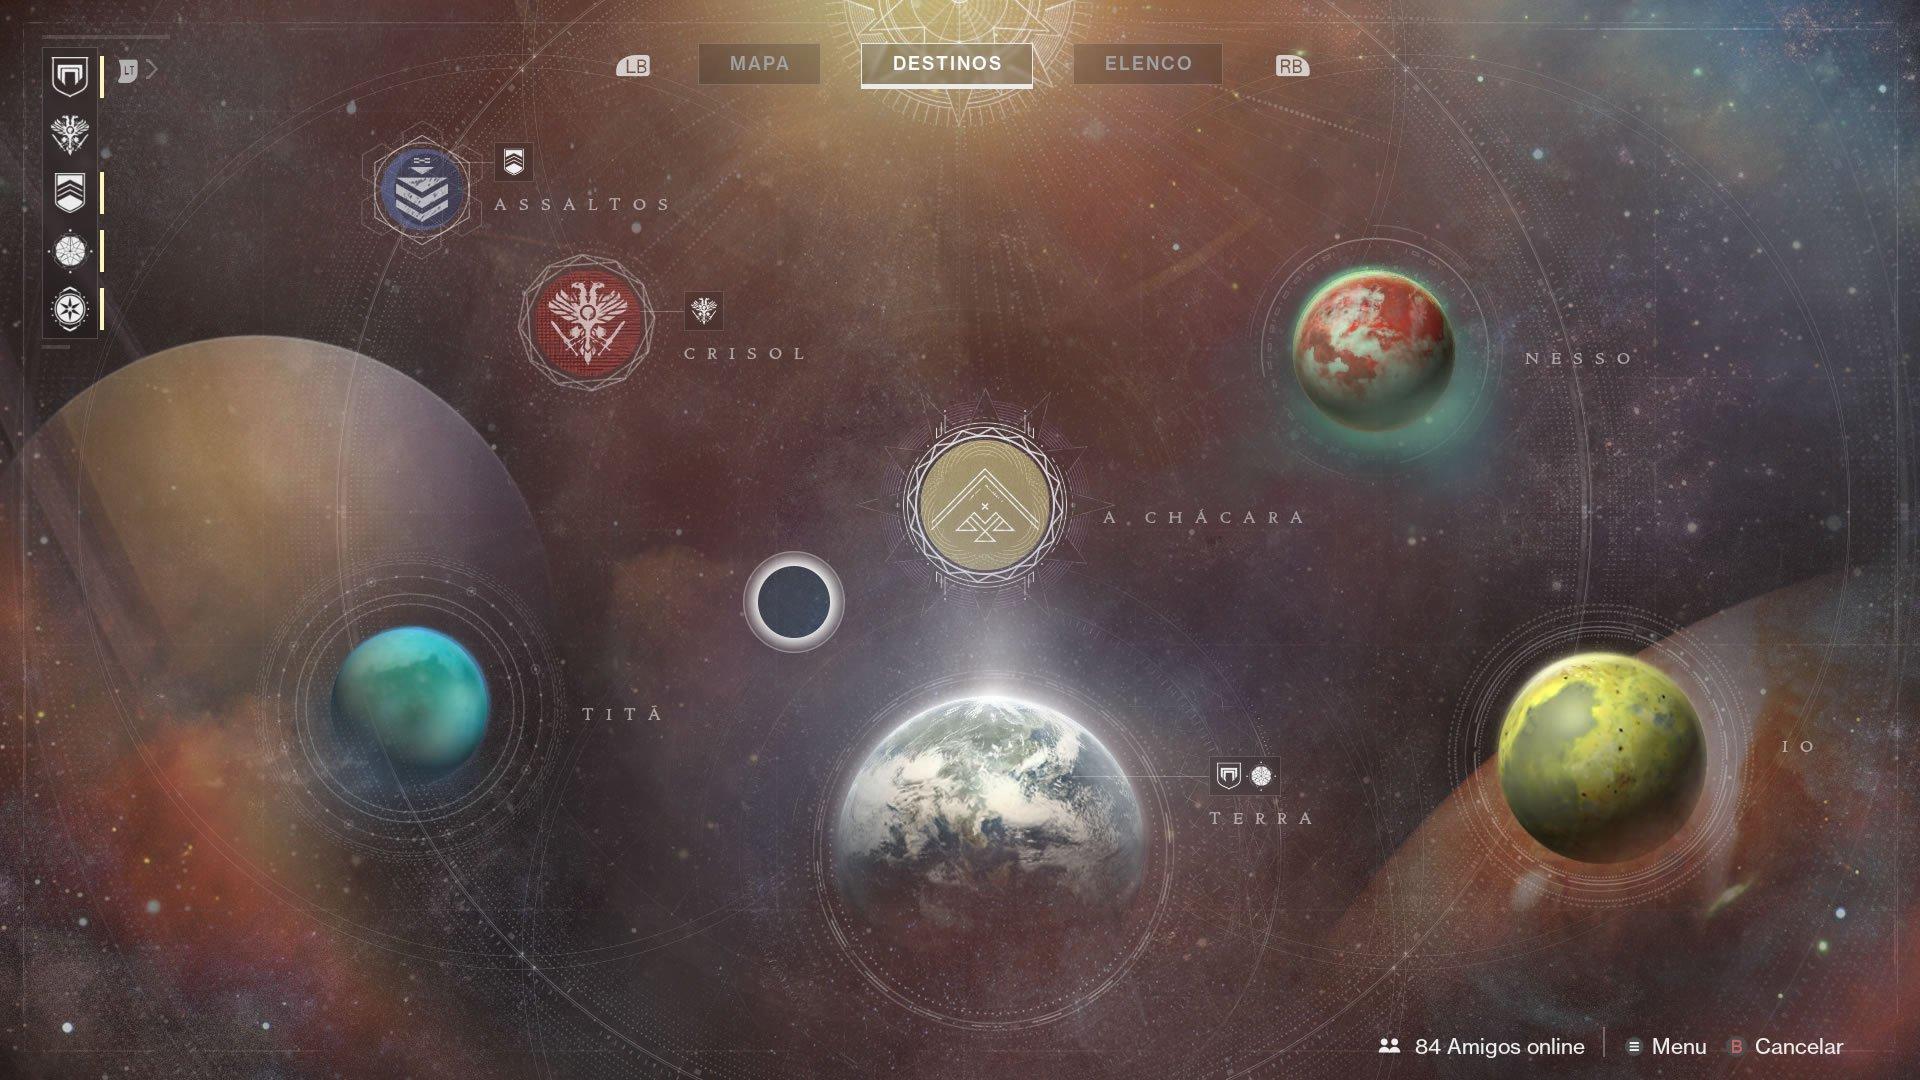 Mapa espacial, novos planetas, novas aventuras!